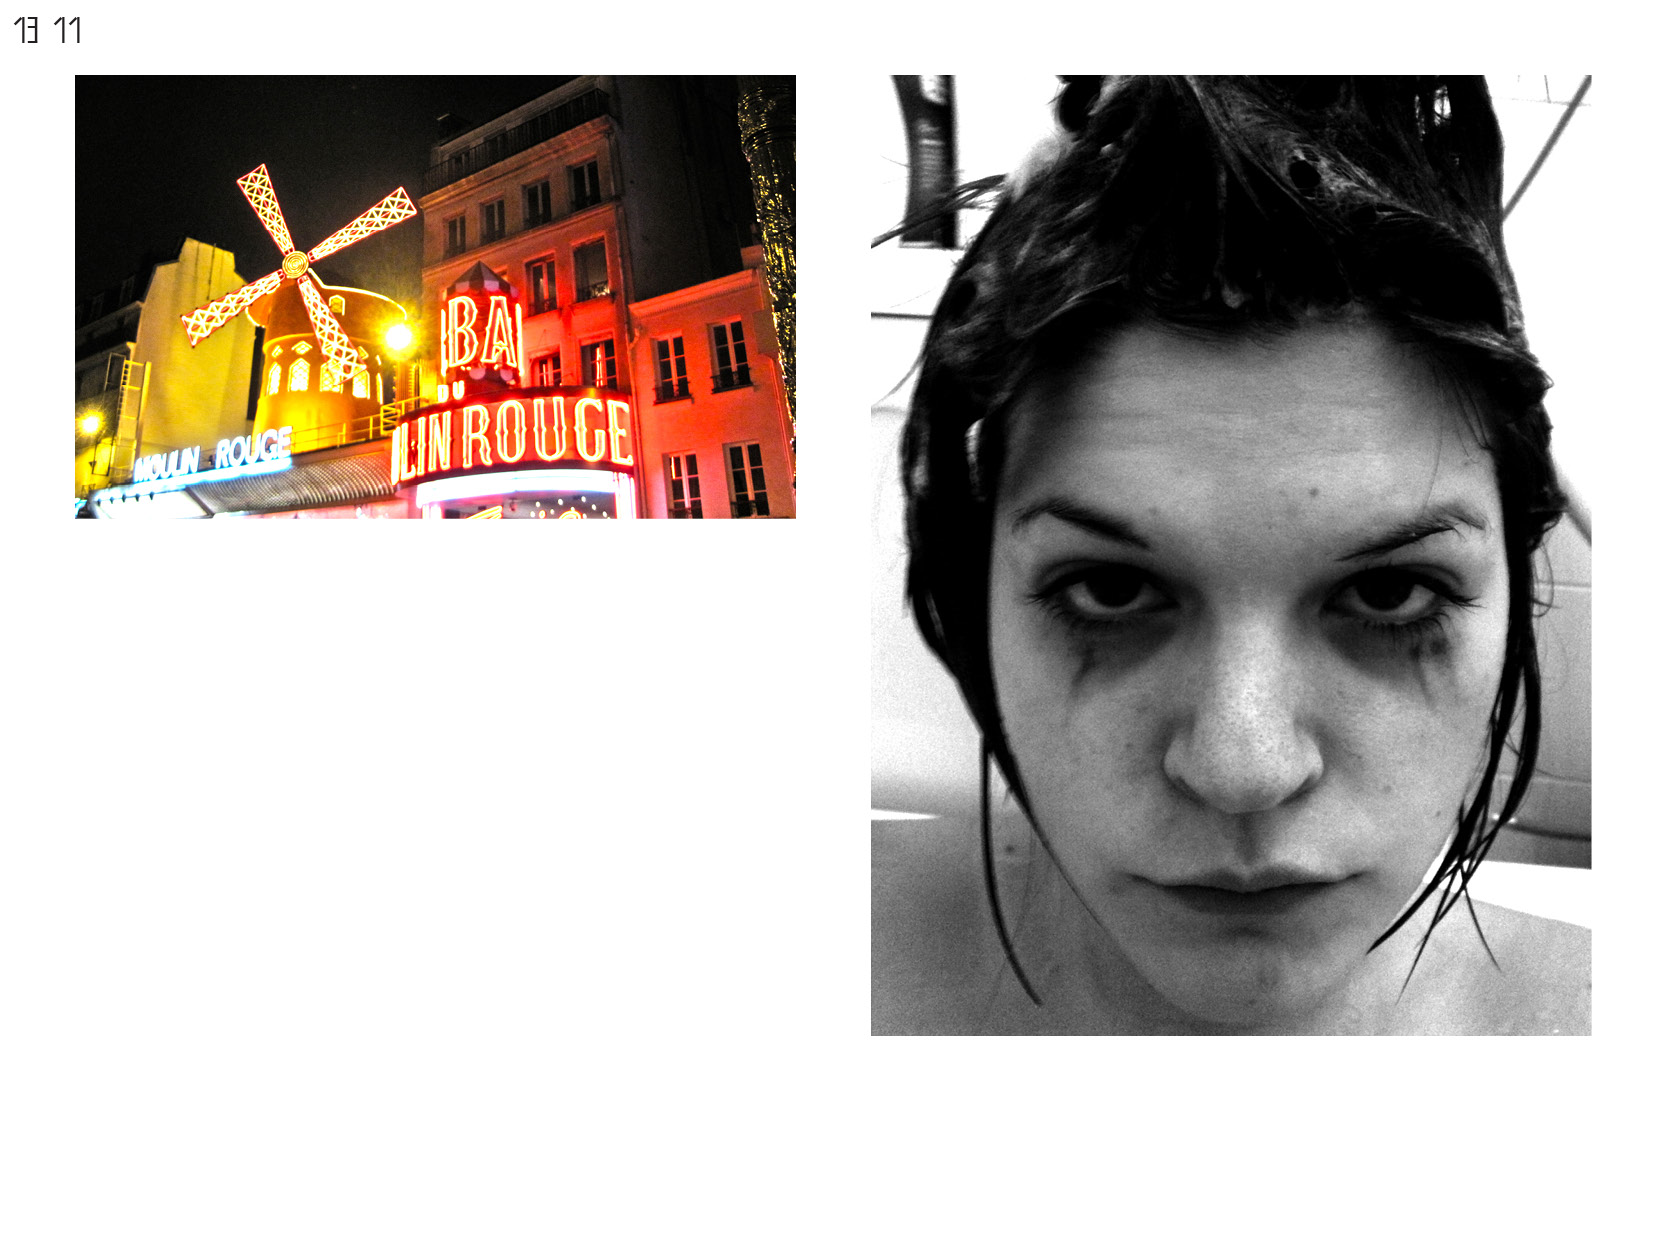 Gerrit-Schweiger-Dialog-Städte-Paris-Berlin-Jessica-Blank-Experiment-Fotoserie-Tagebuch-visuelle-Kommunikation-28